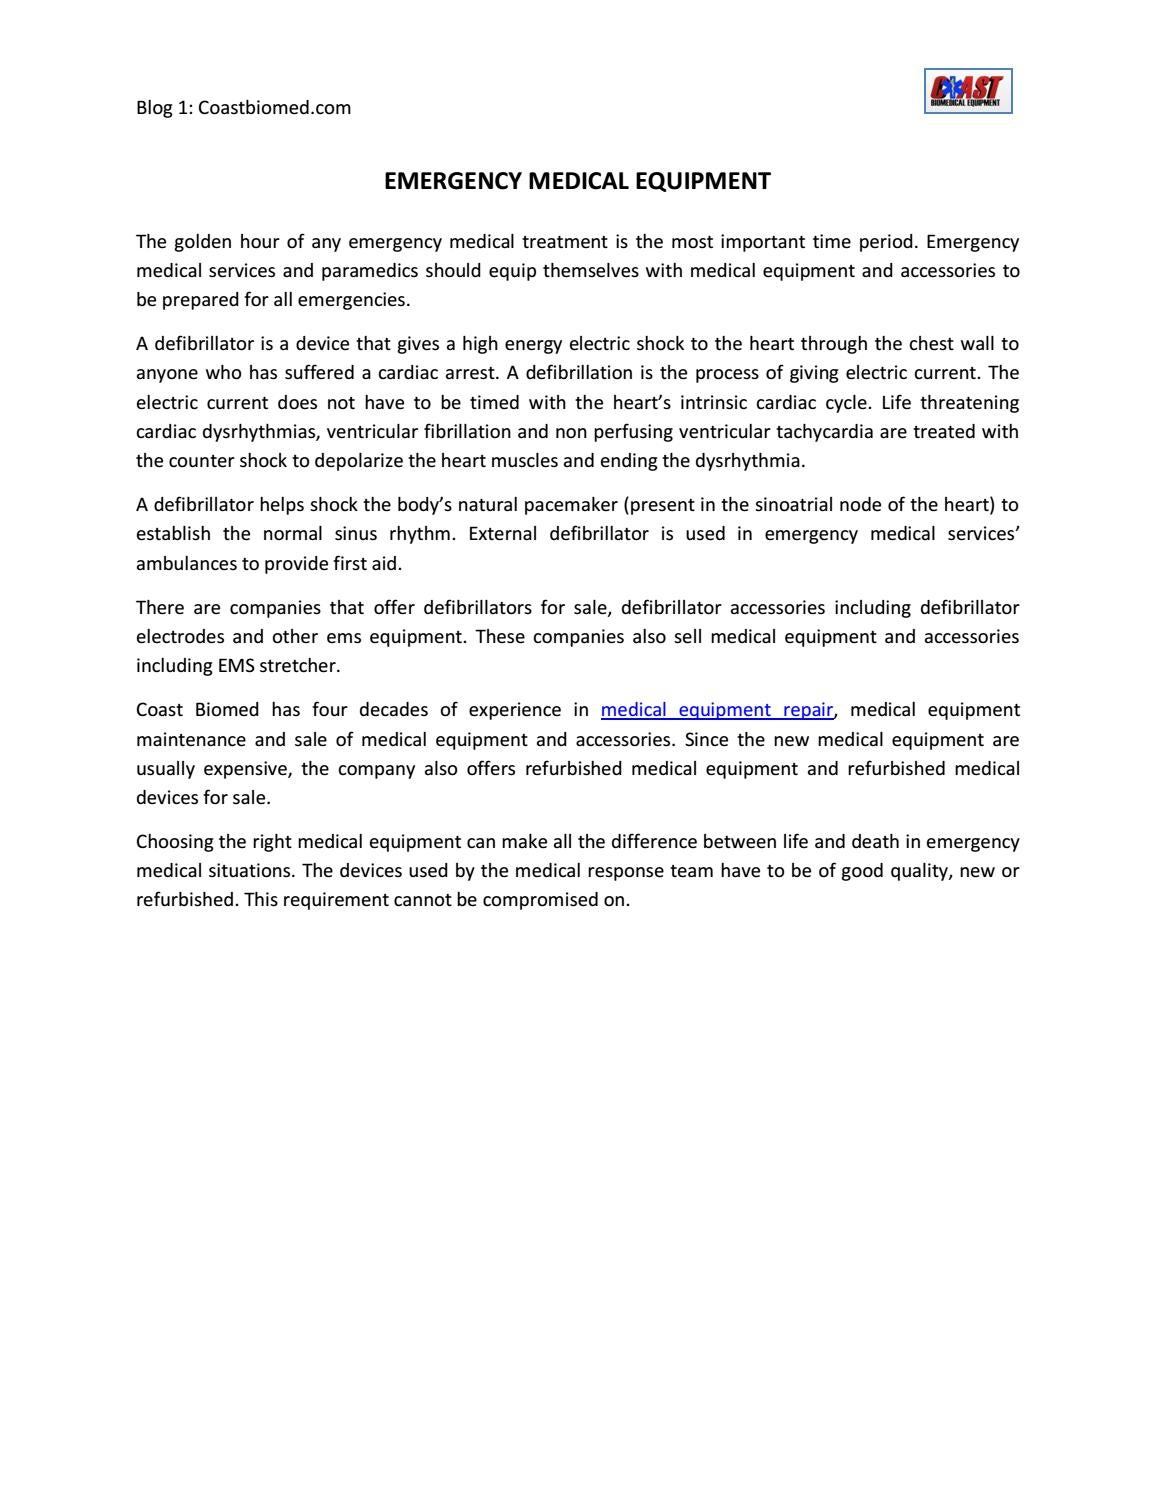 Emergency Medical Equipment by coastbiomed - issuu